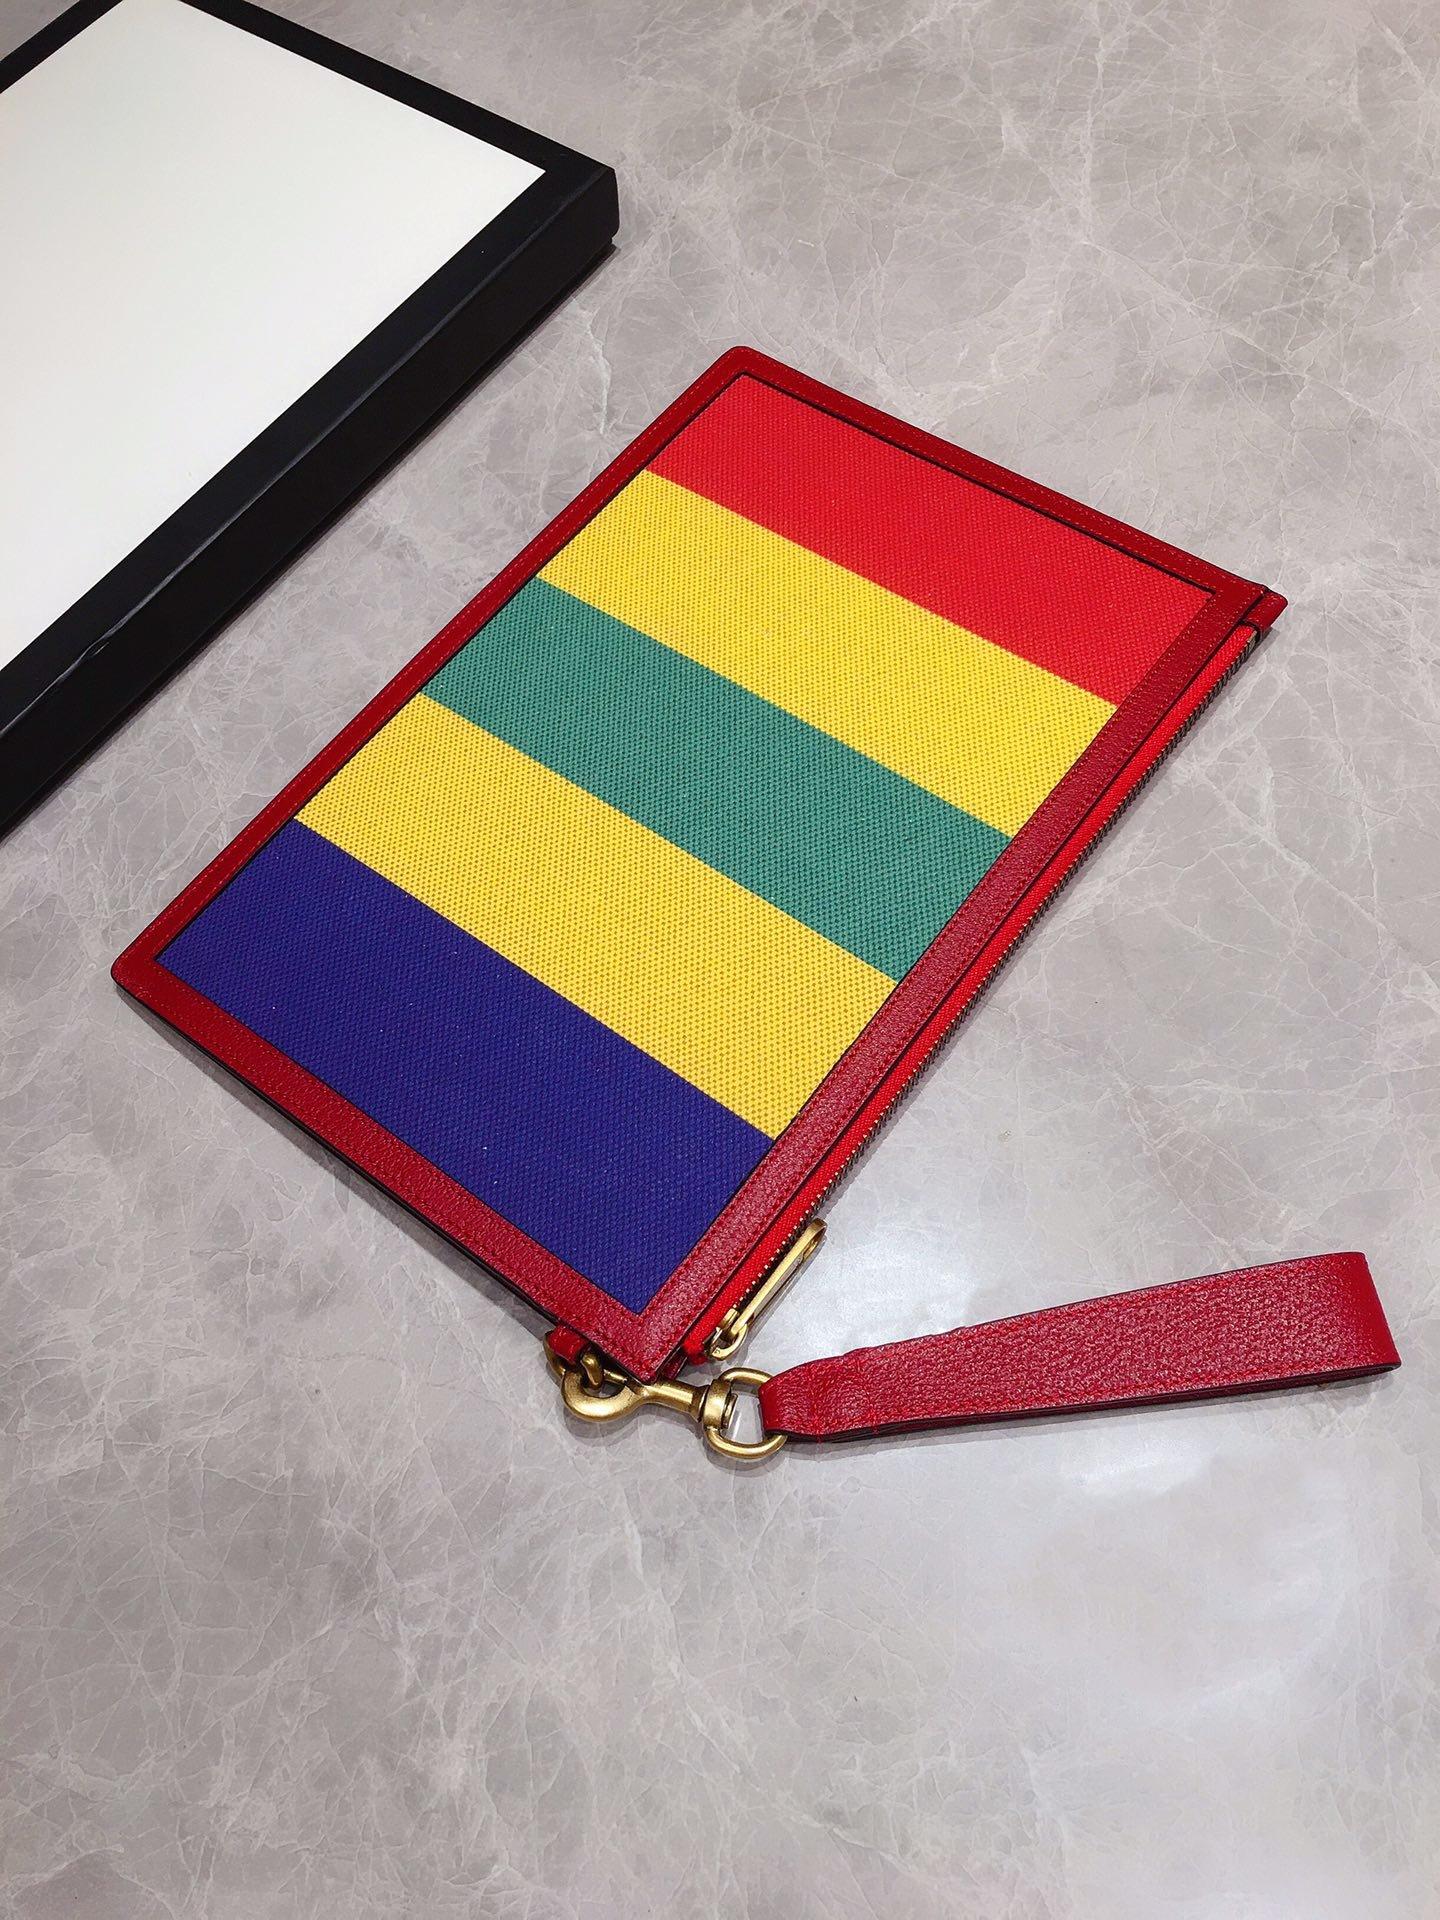 Gucci专柜同步上新 原单出品 Baiadera宽条纹帆布手拿包 (图4)